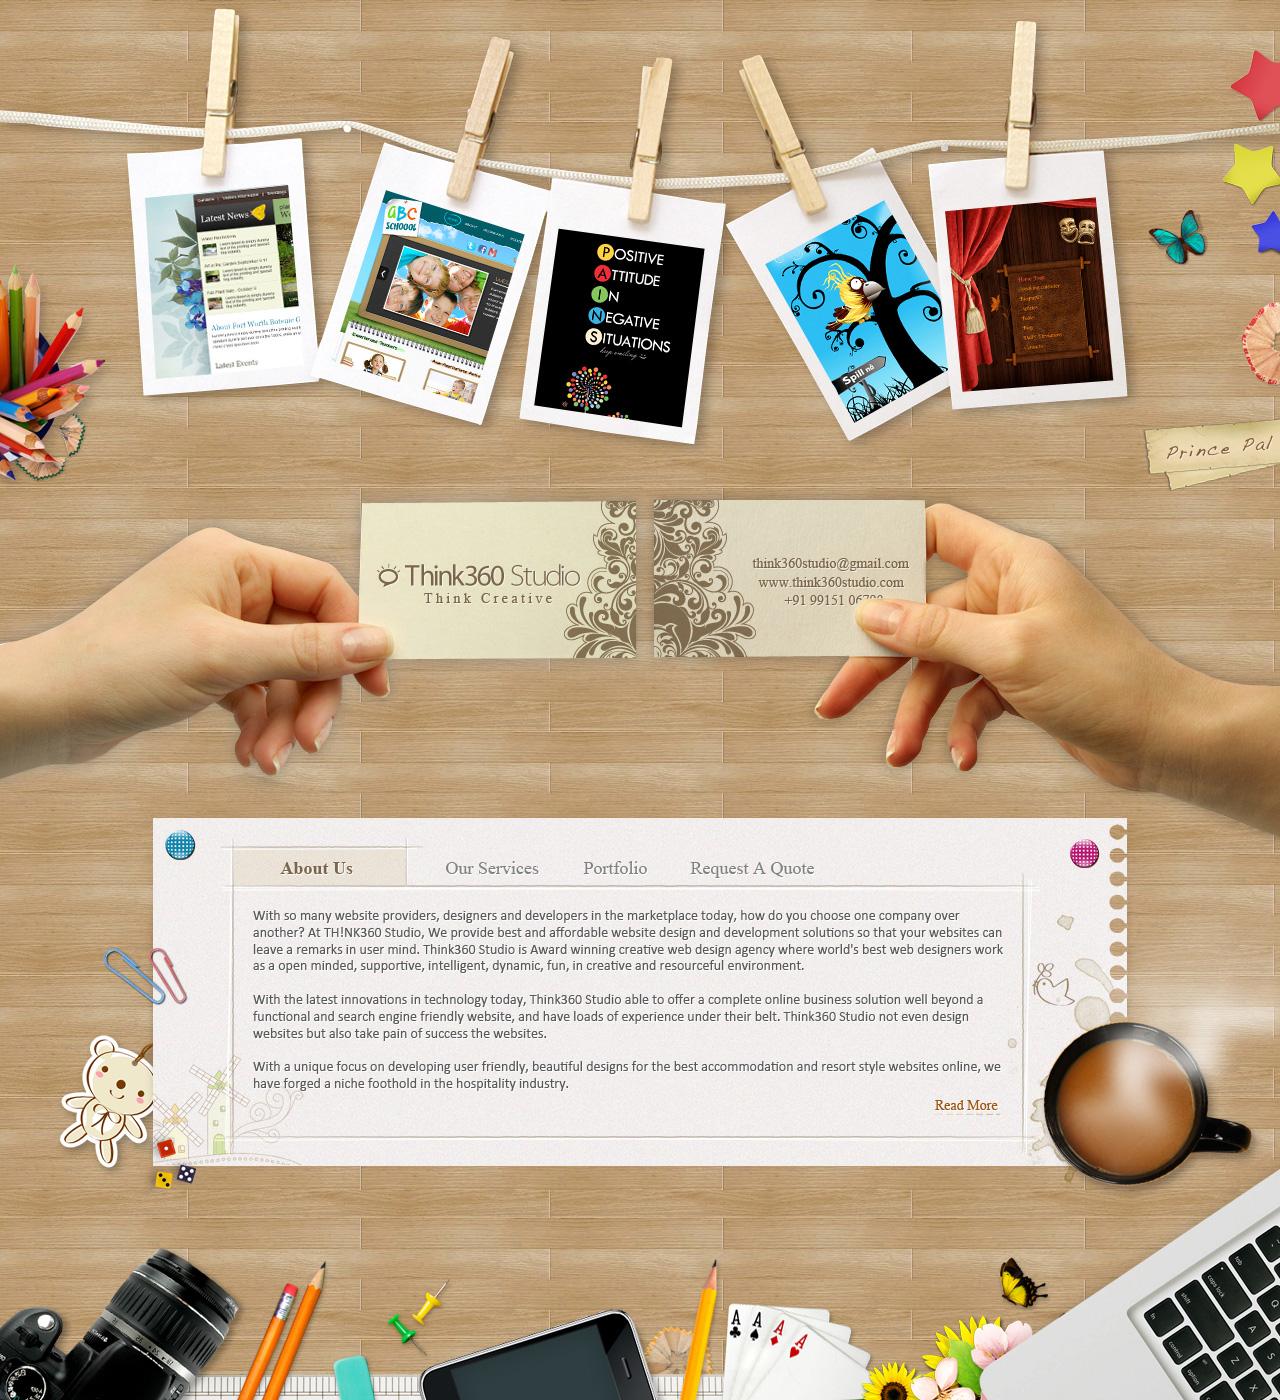 www.Think360Studio.com - A Web Design Agency India